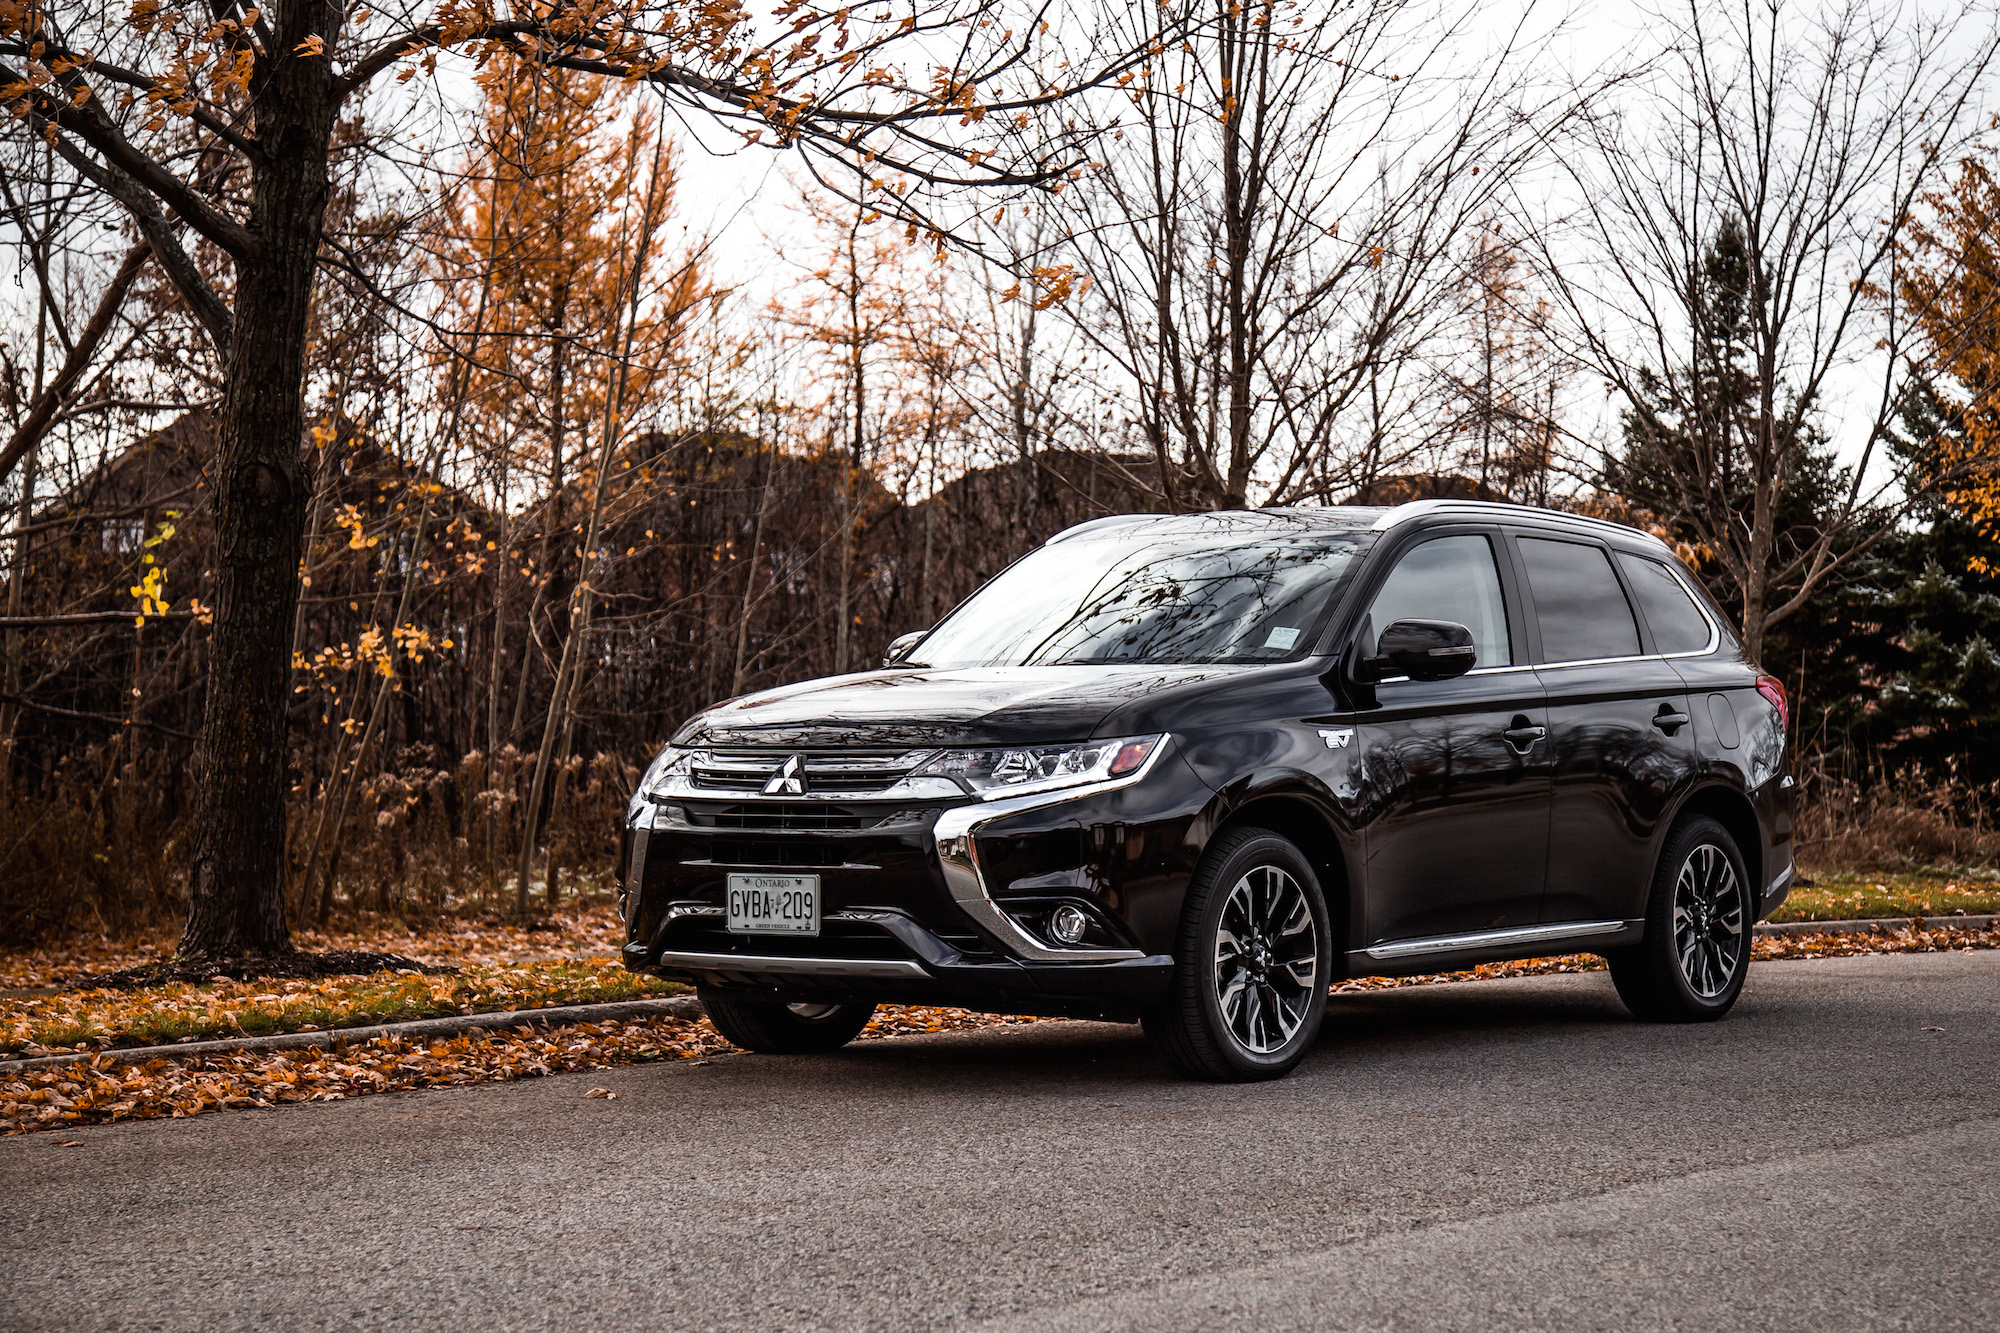 Review 2018 Mitsubishi Outlander Phev Car